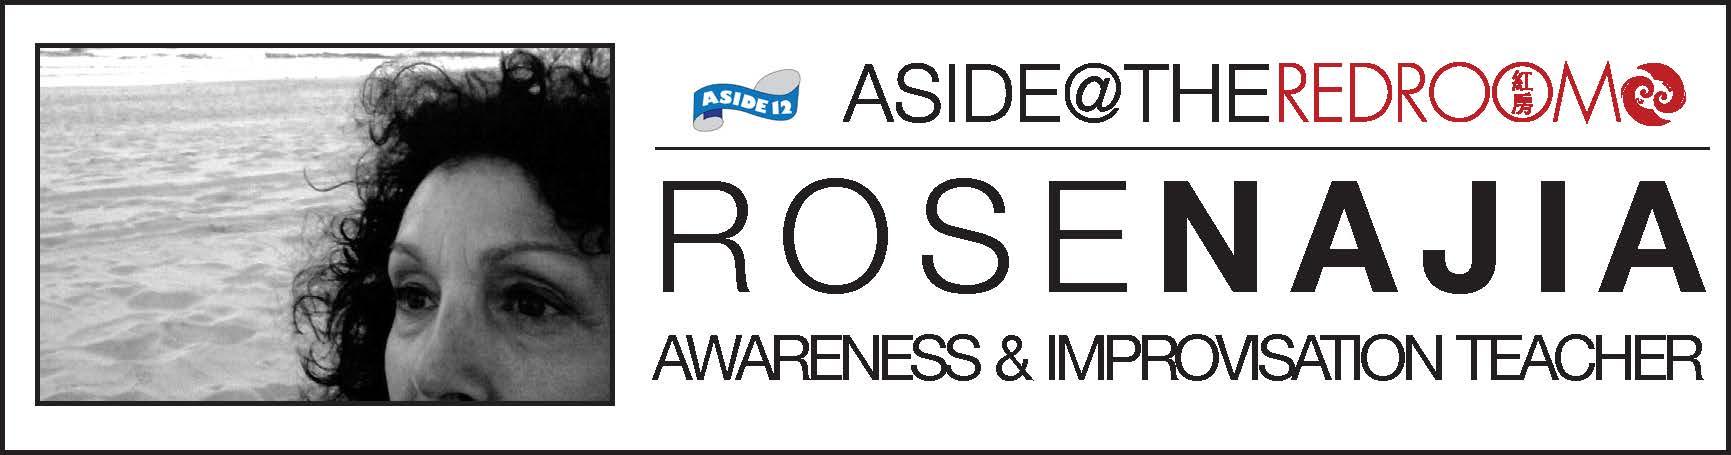 ASIDE 12 PRESENTERS rose